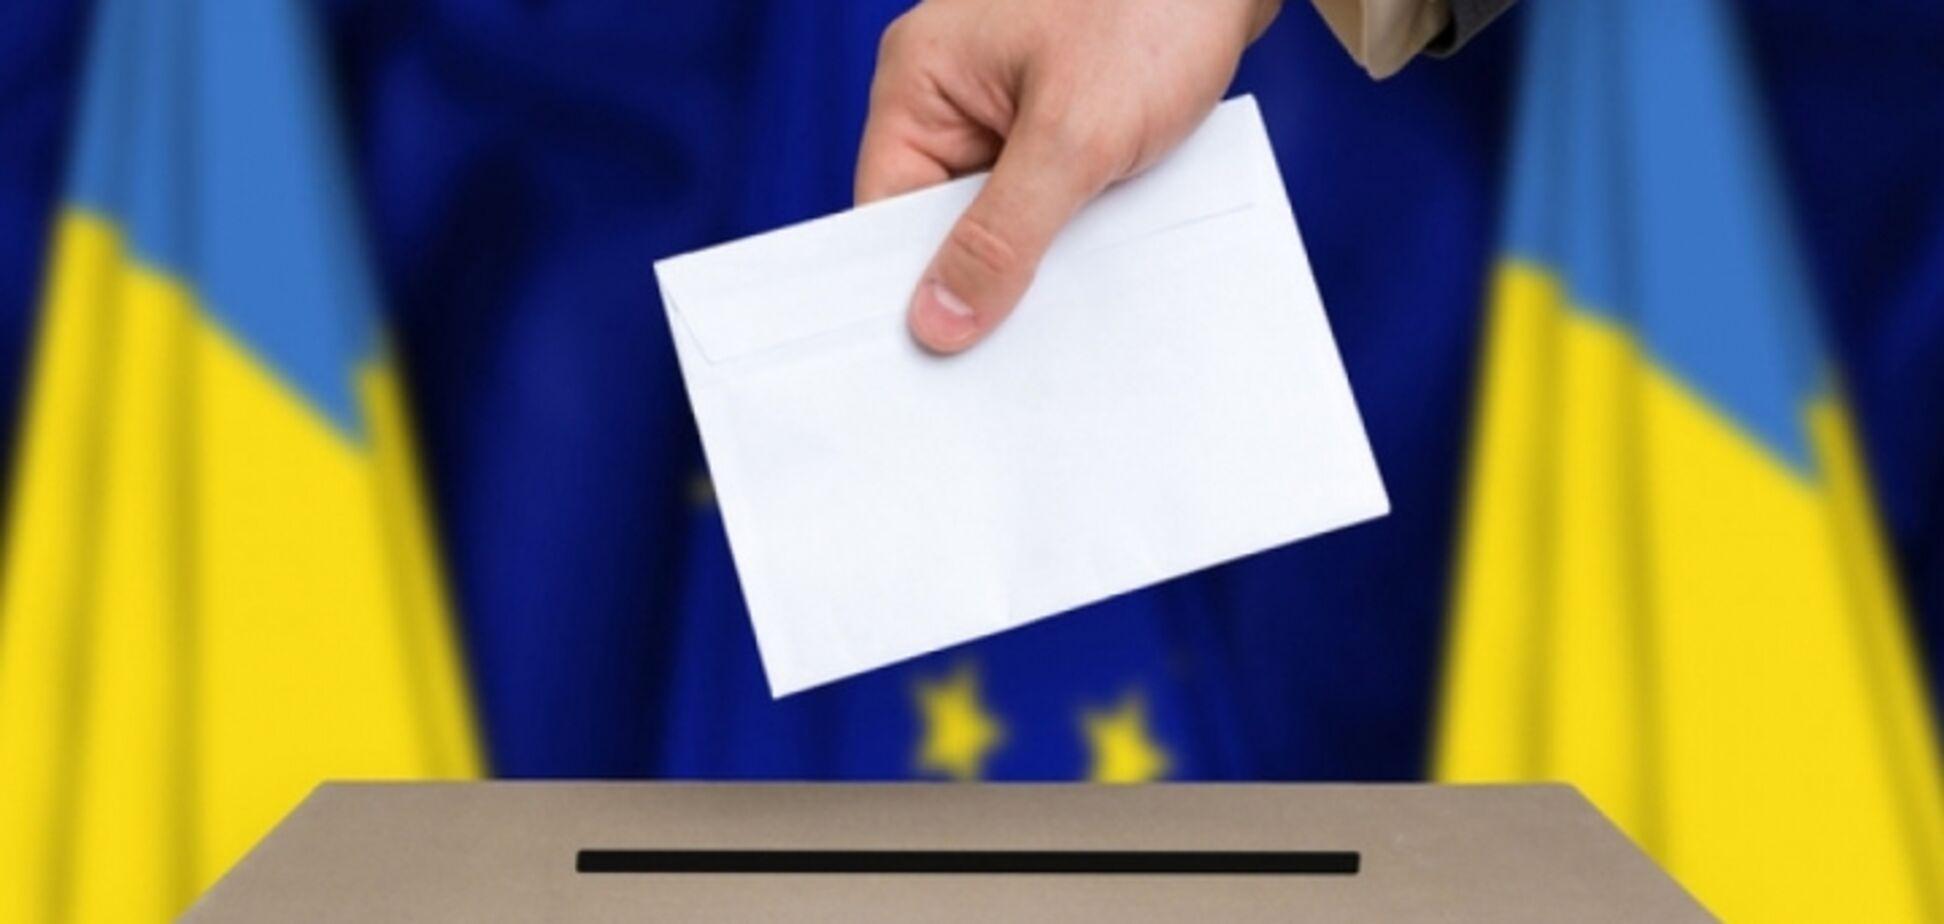 Украина: кто победит на выборах президента в 2019-м году